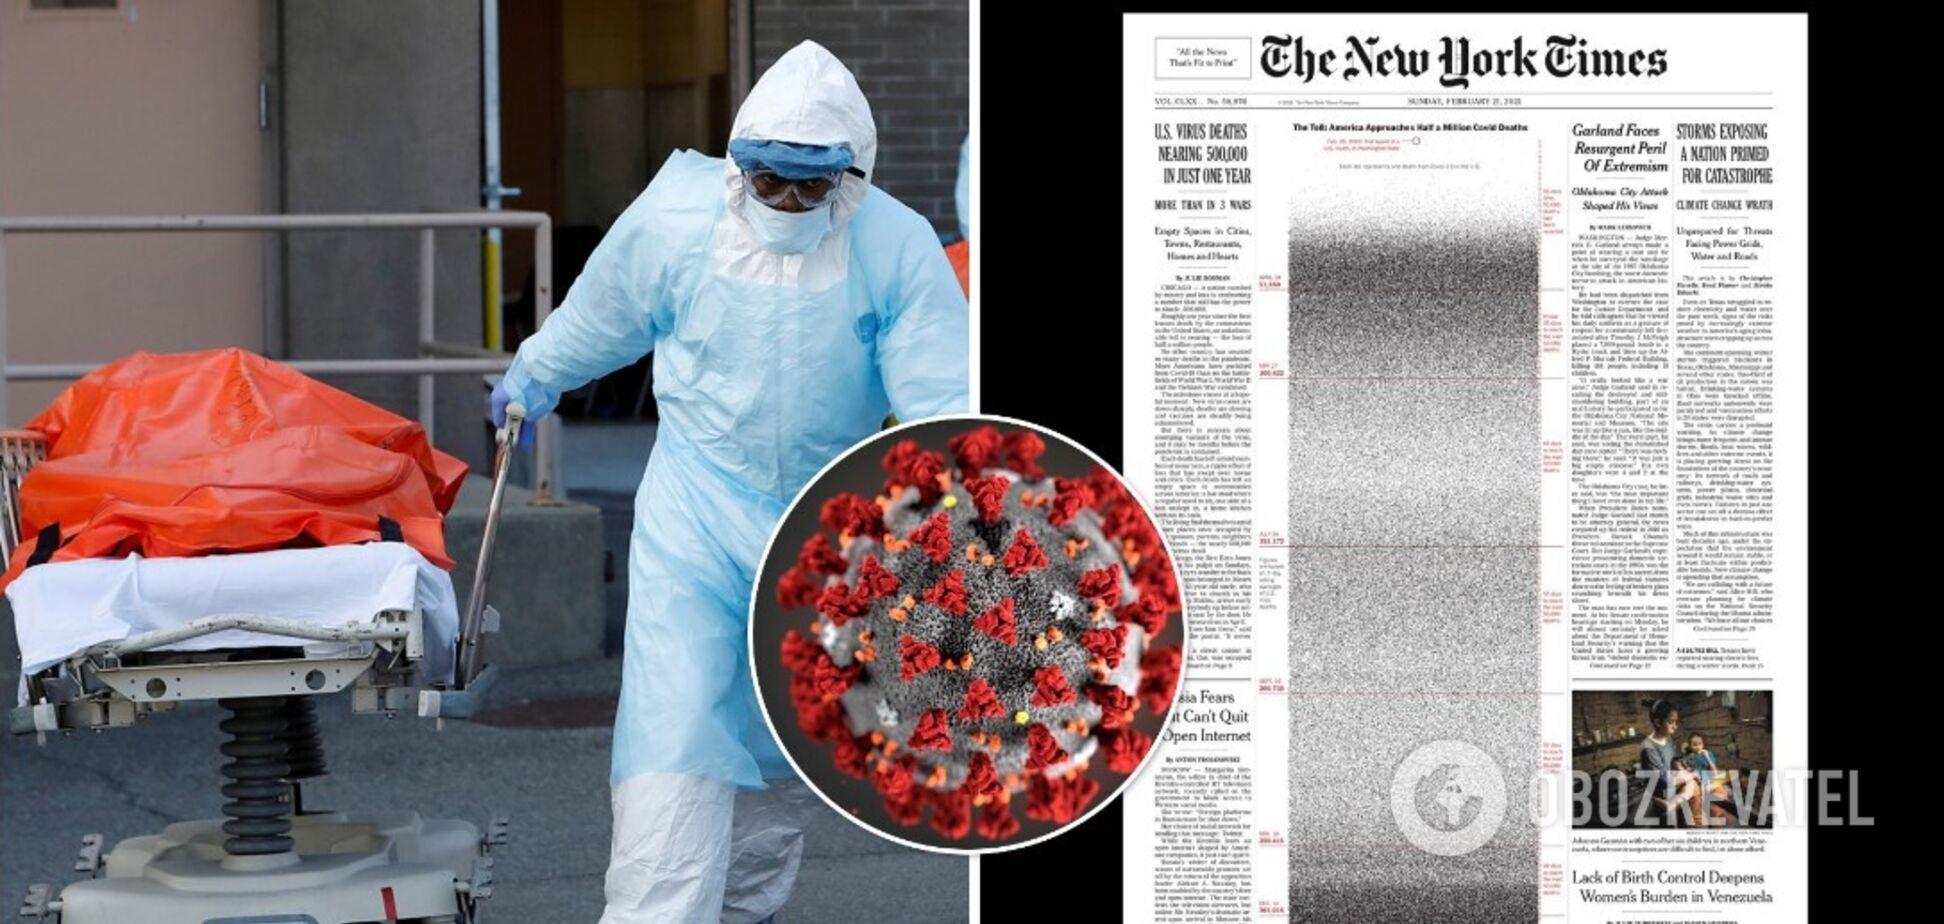 The New York Times показал смерти 500 тыс американцев от коронавируса